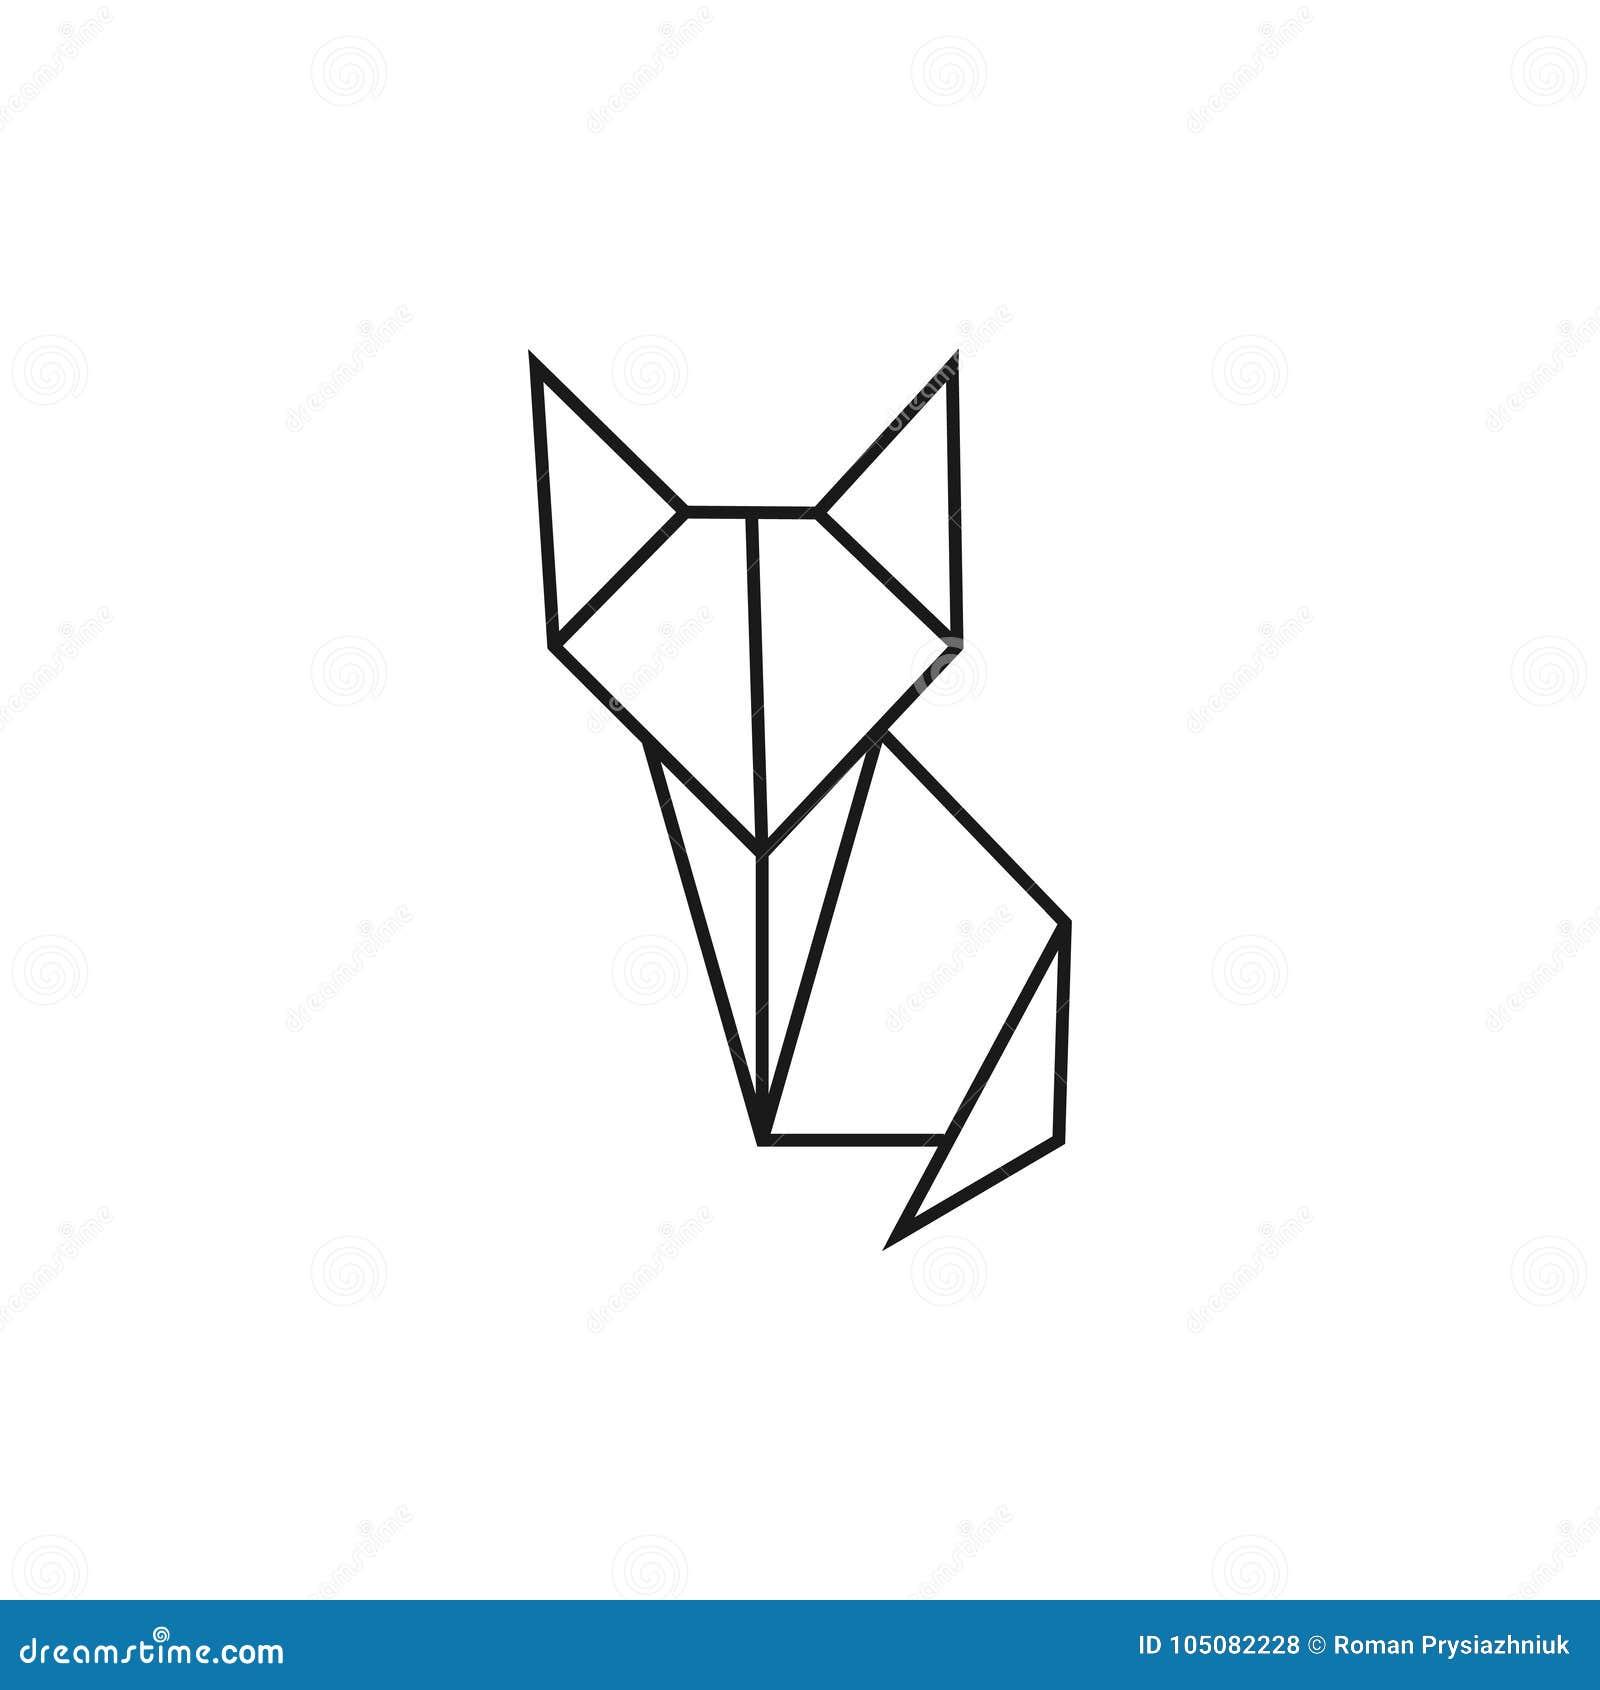 Origami Cat. Geometric Line Shape For Art Of Folded Paper